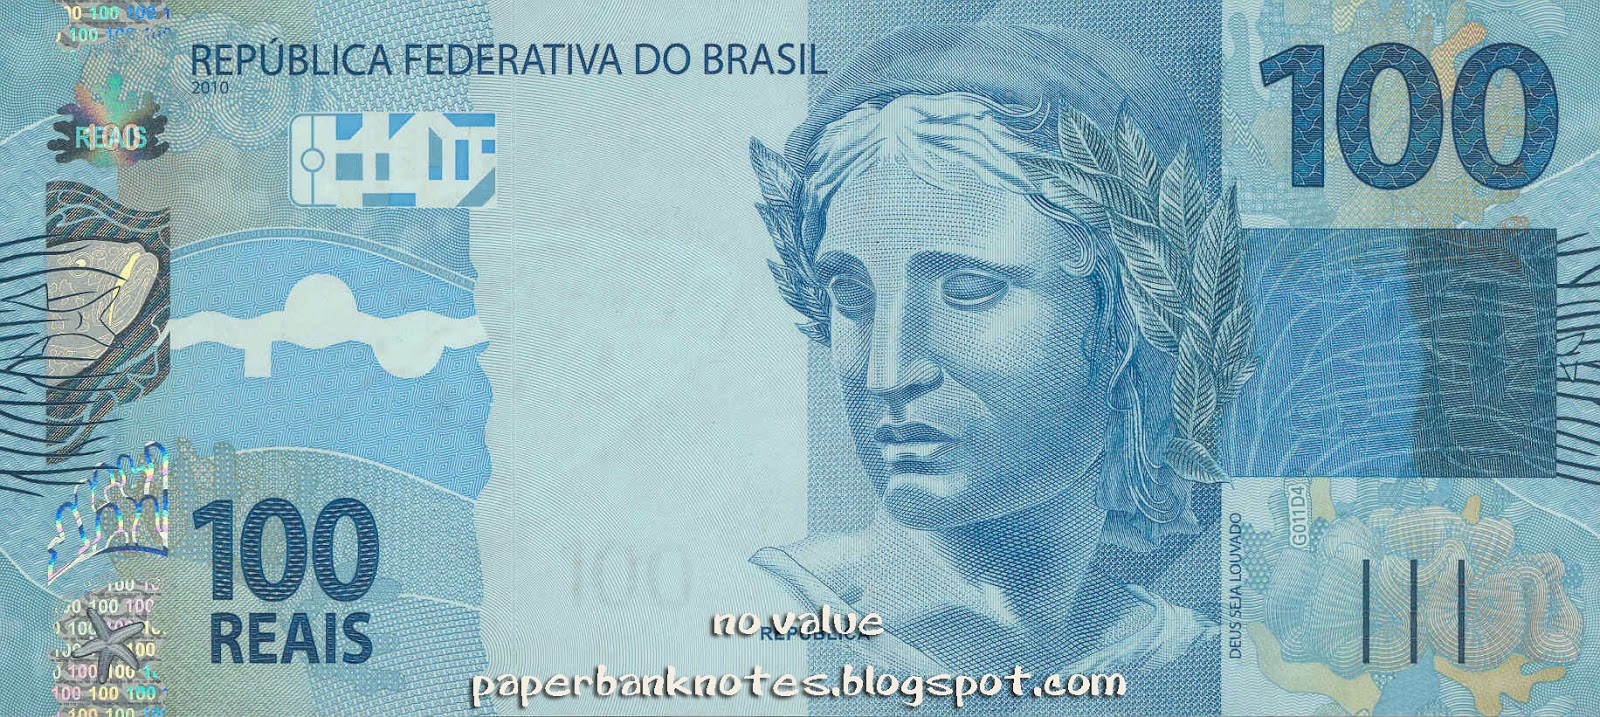 http://americabanknotes.blogspot.com/2014/05/brazil-2010-full-set.html